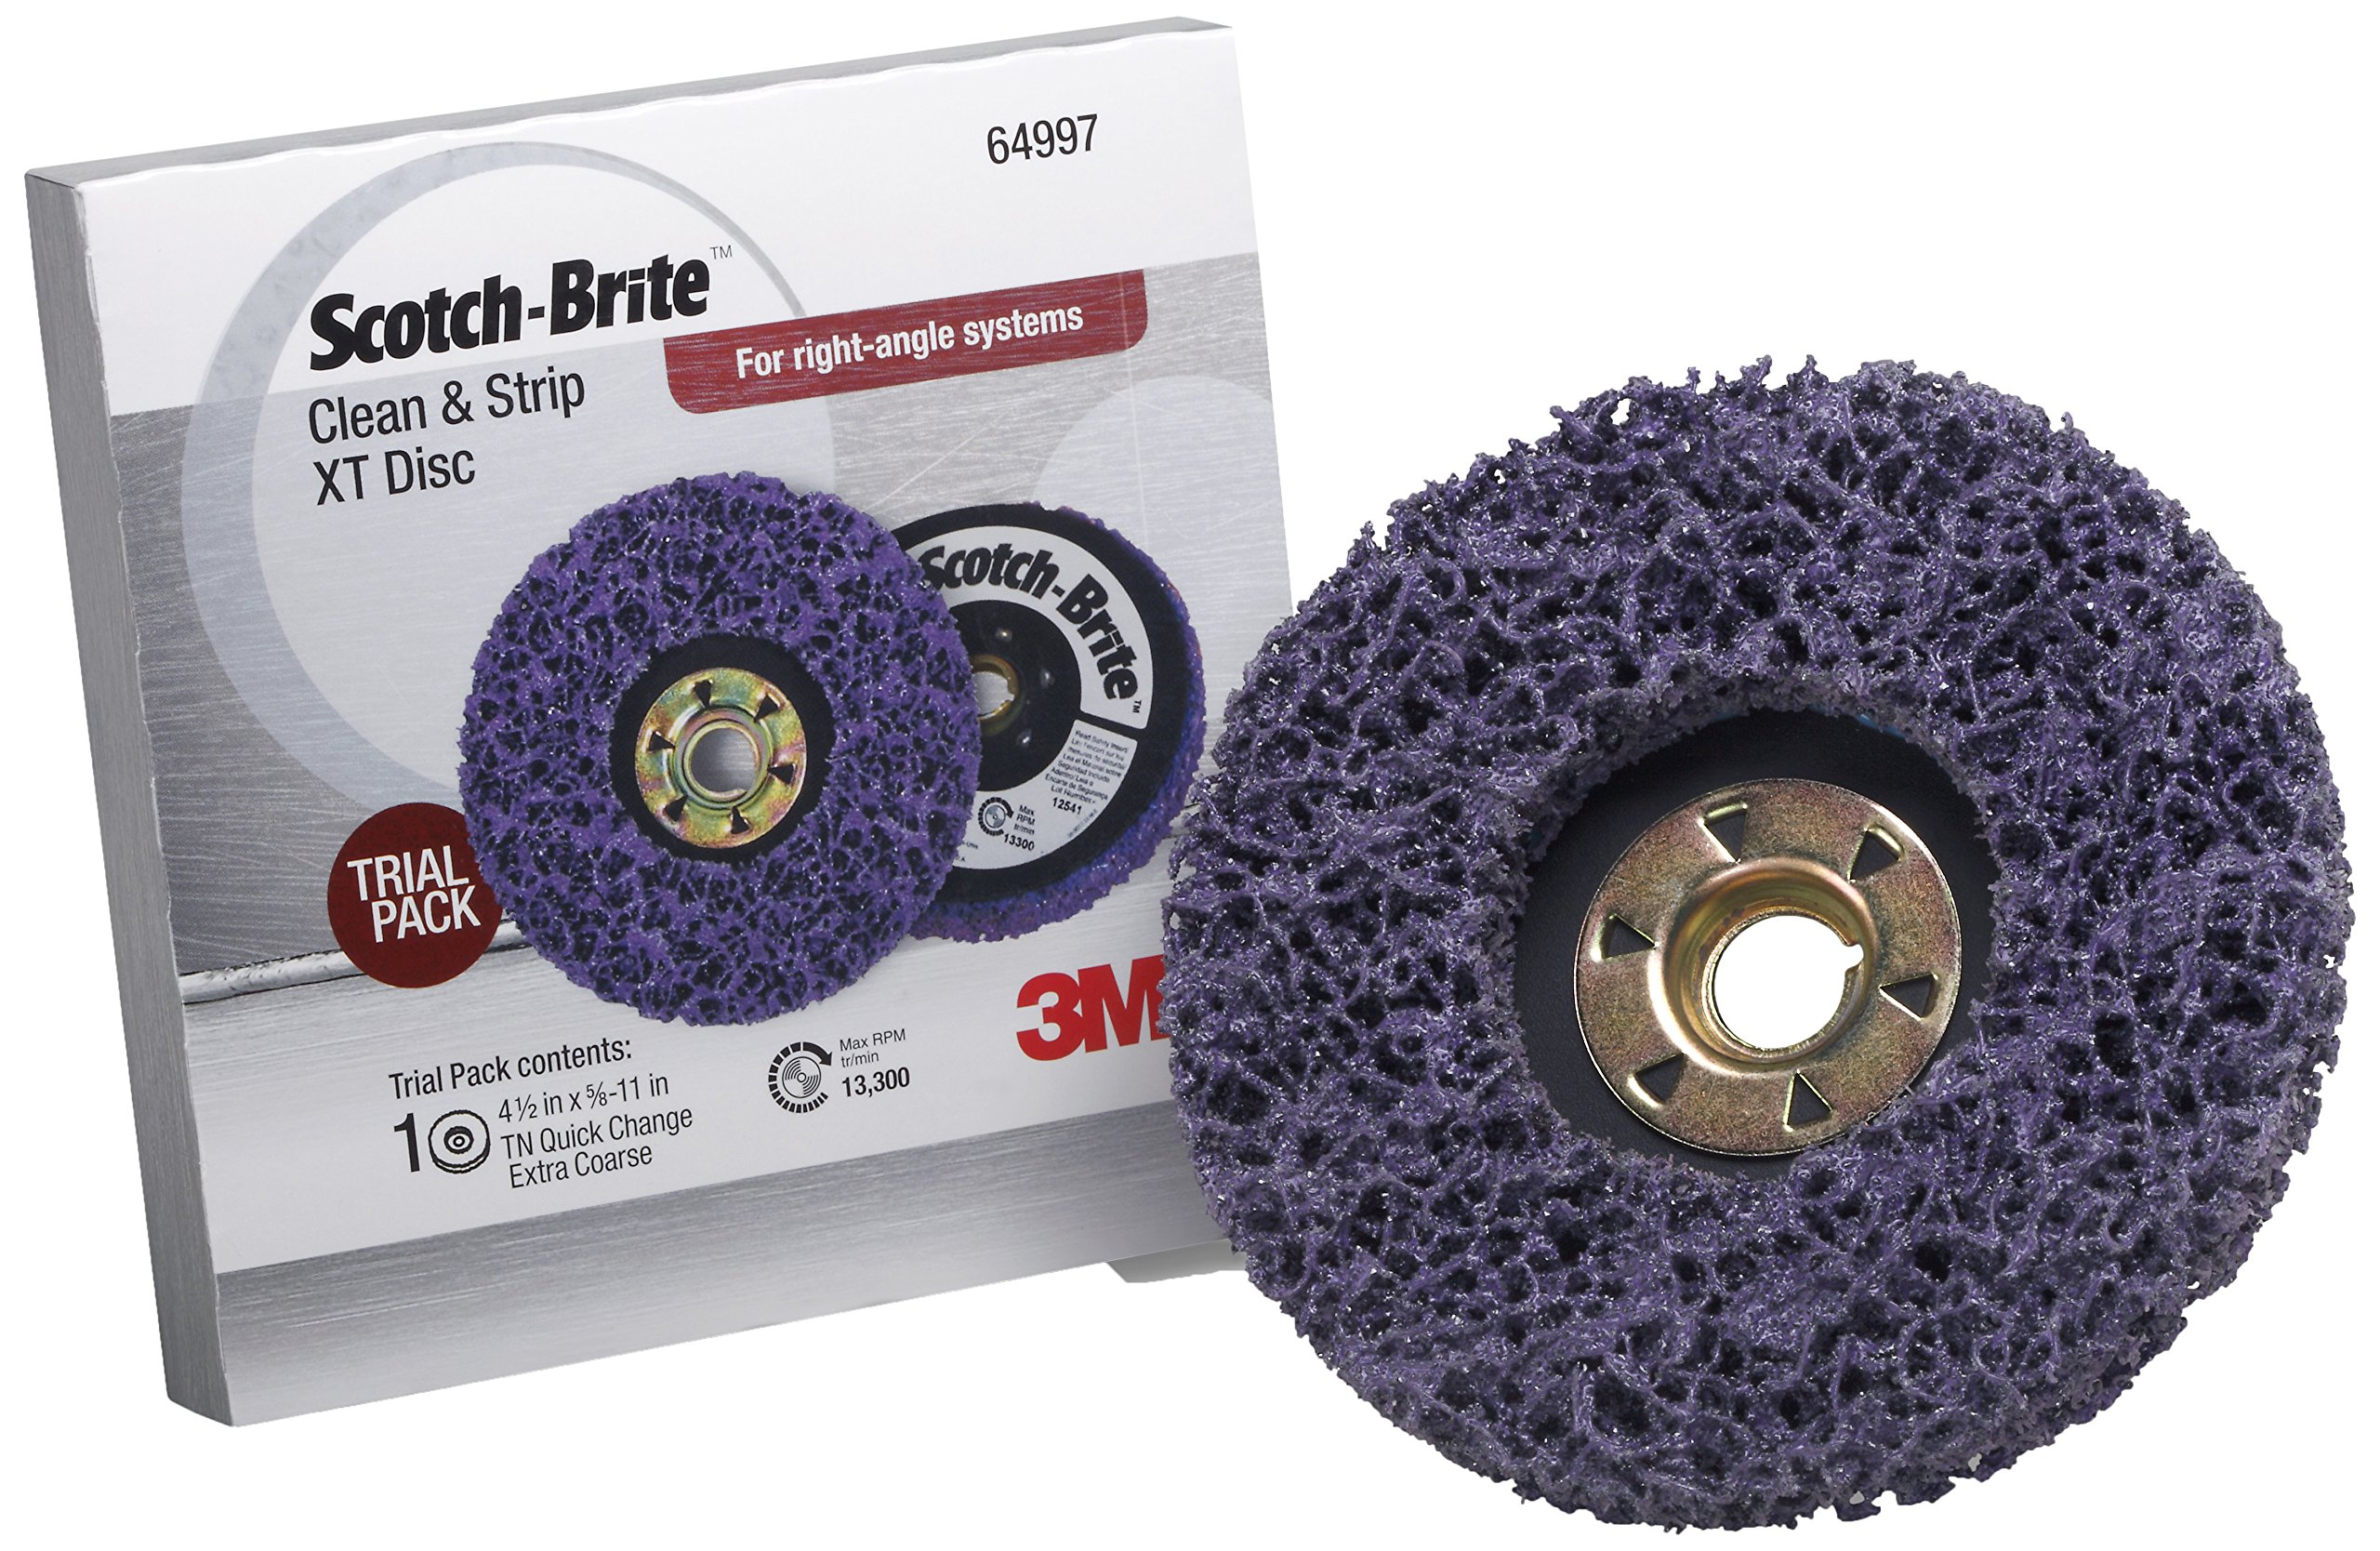 Scotch-Brite(TM) Clean and Strip XT Disc TN Quick Change Trial Pack, 4-1/2 in x 5/8 in-11 S XCS, 1 Trial Pack